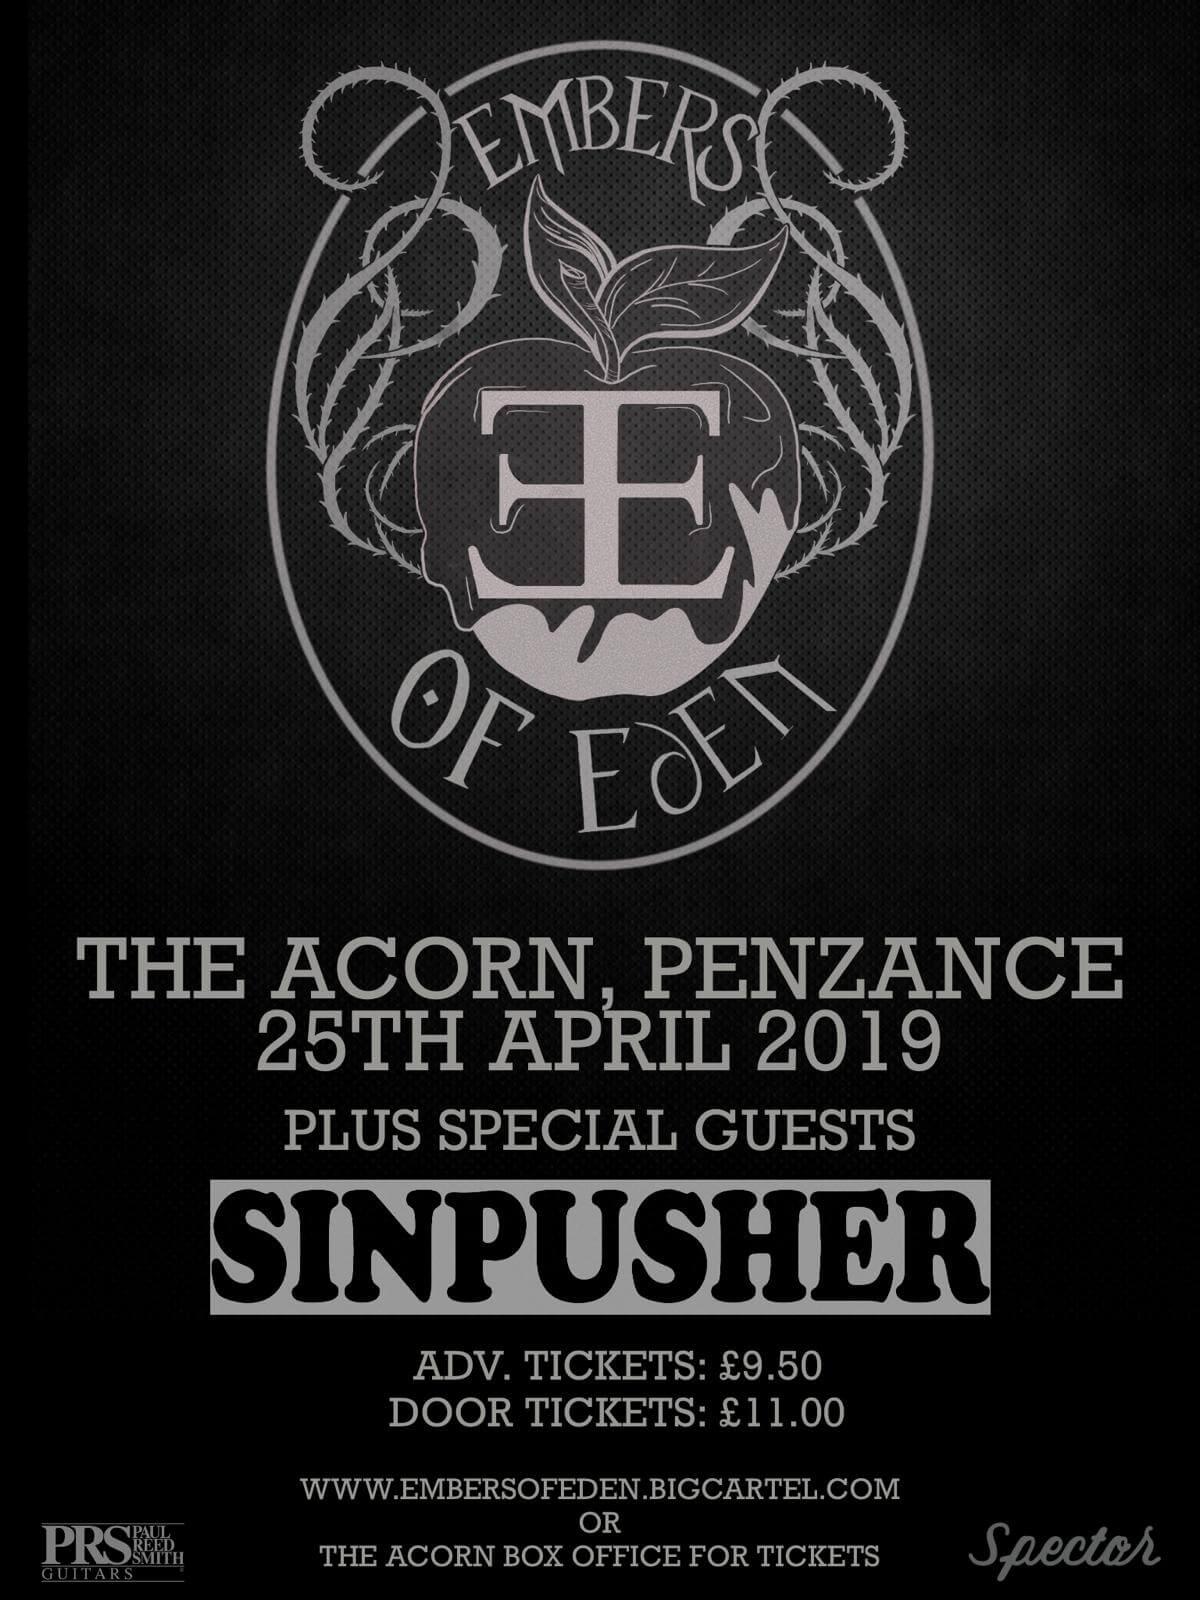 Embers Of Eden + Special Guests Sinpusher